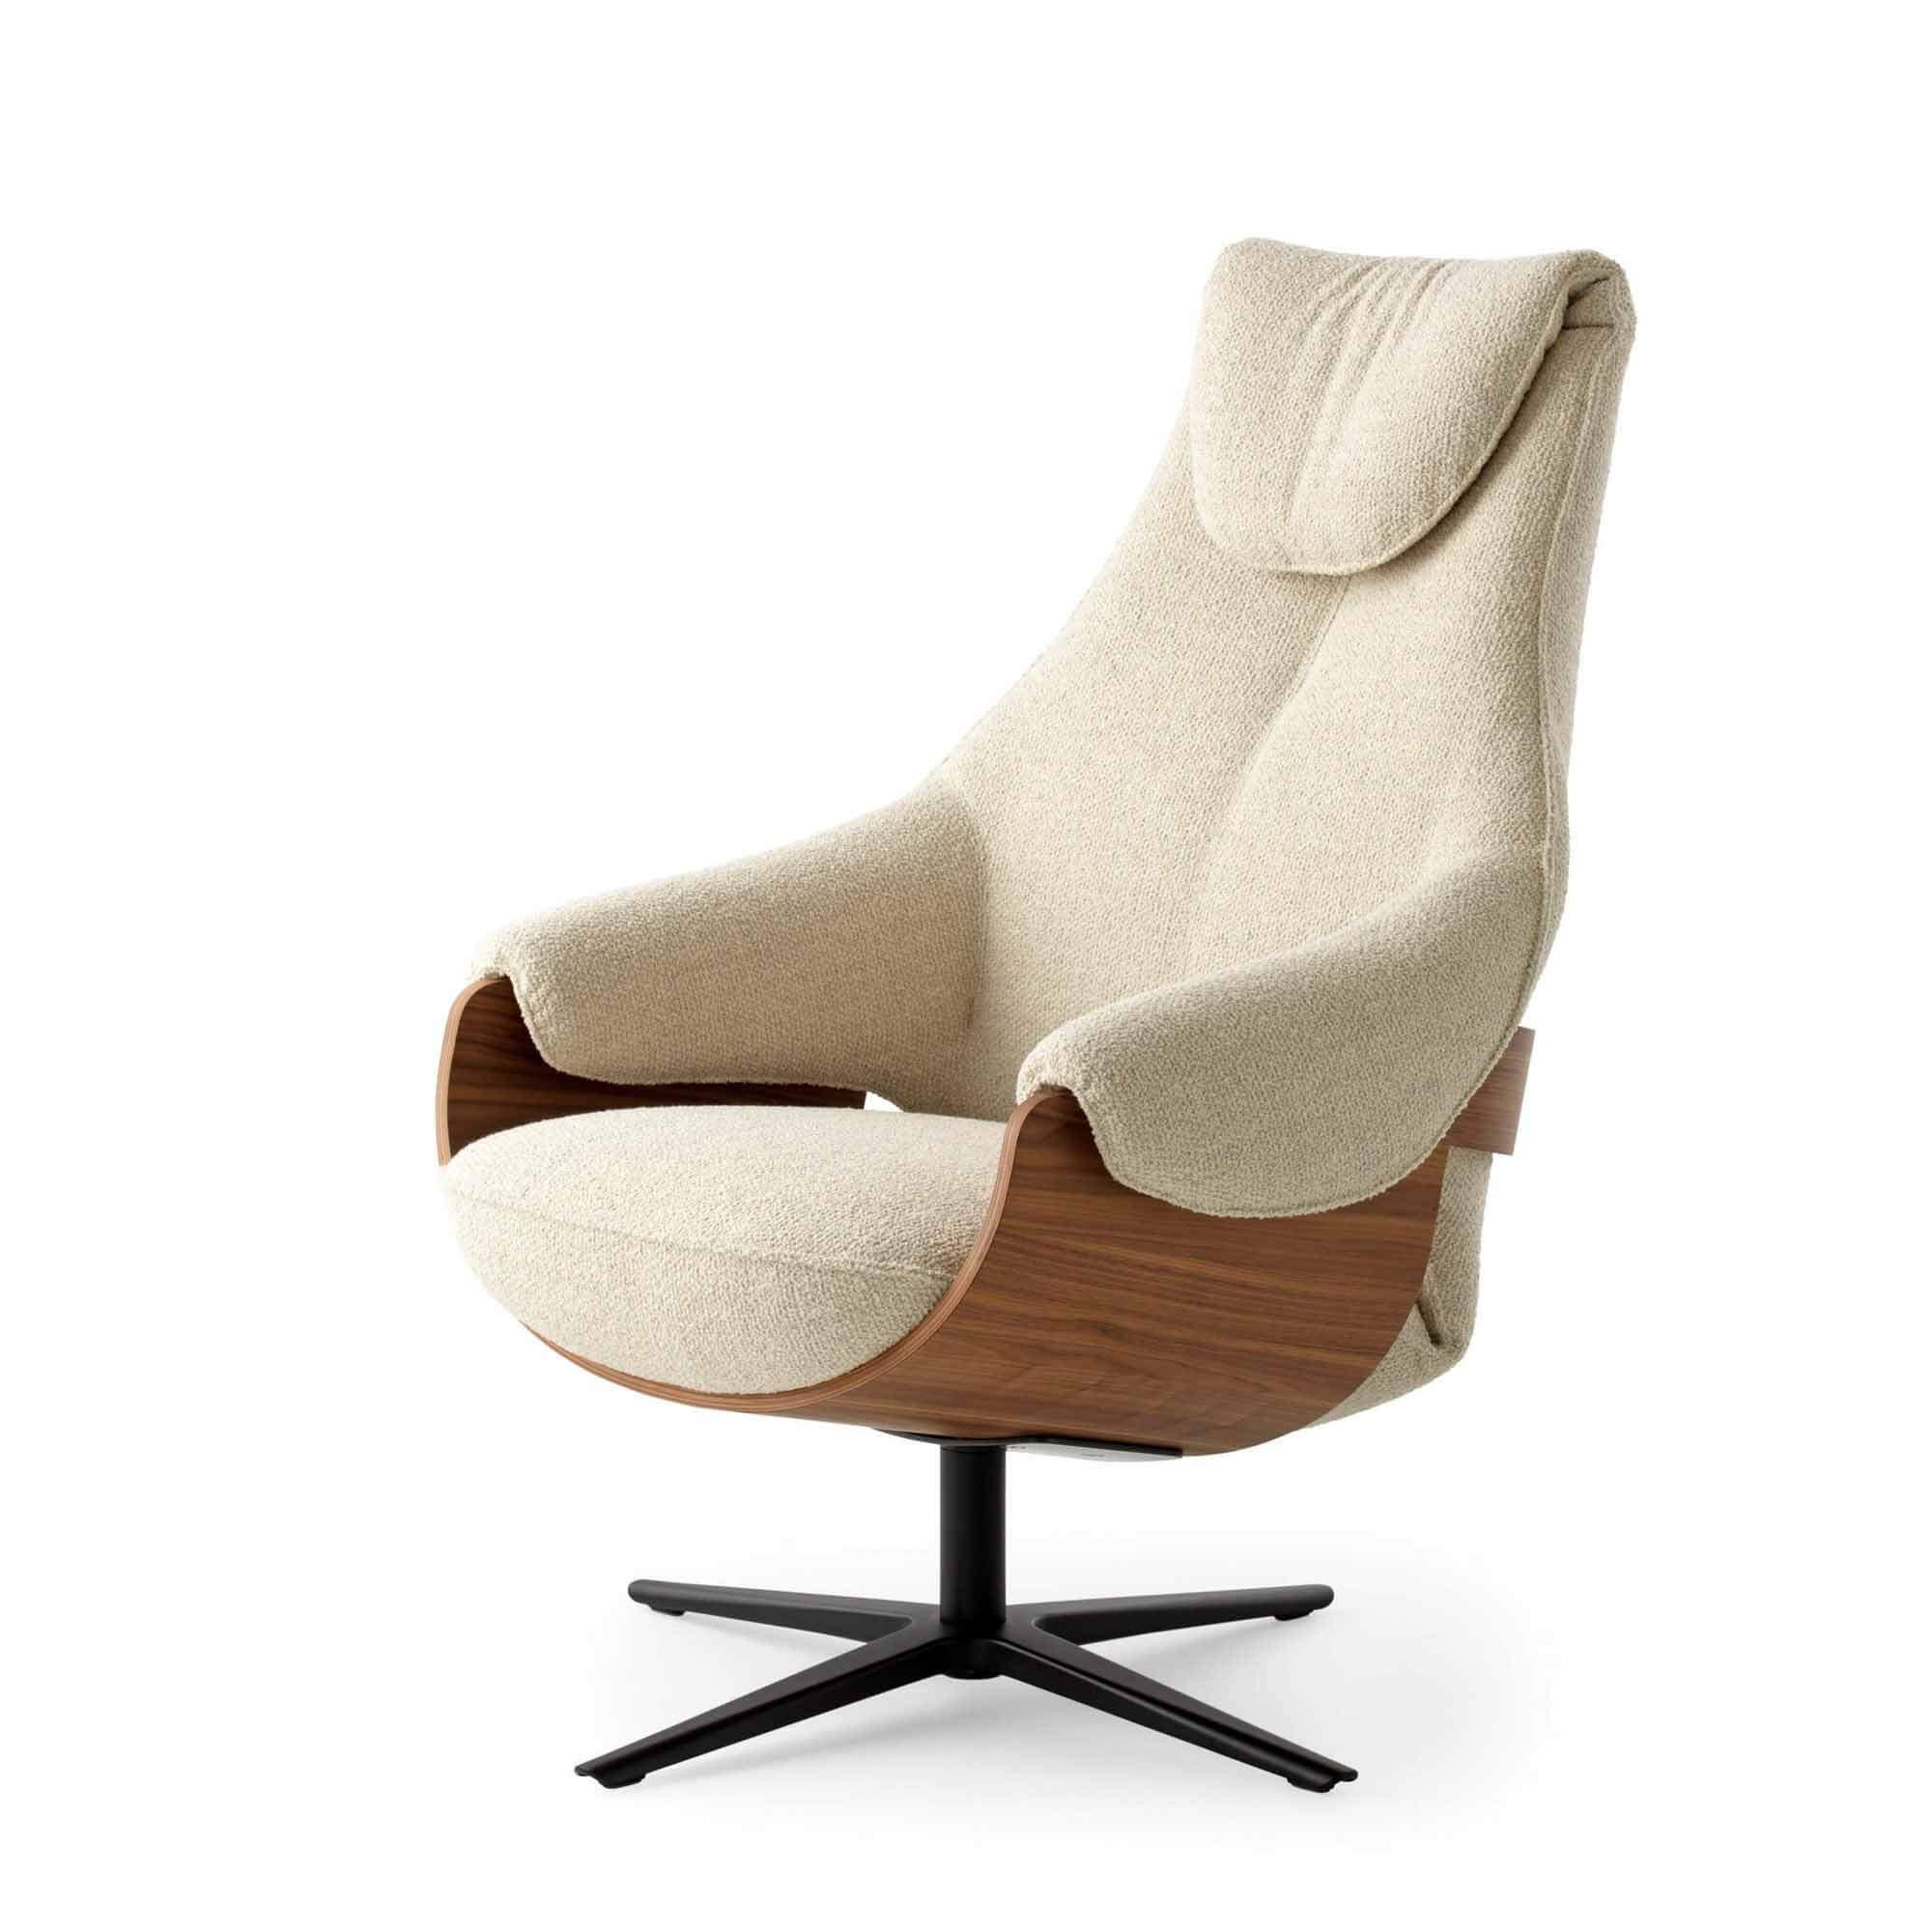 Кресло LXR10 от Studio Truly Truly для Leolux LX